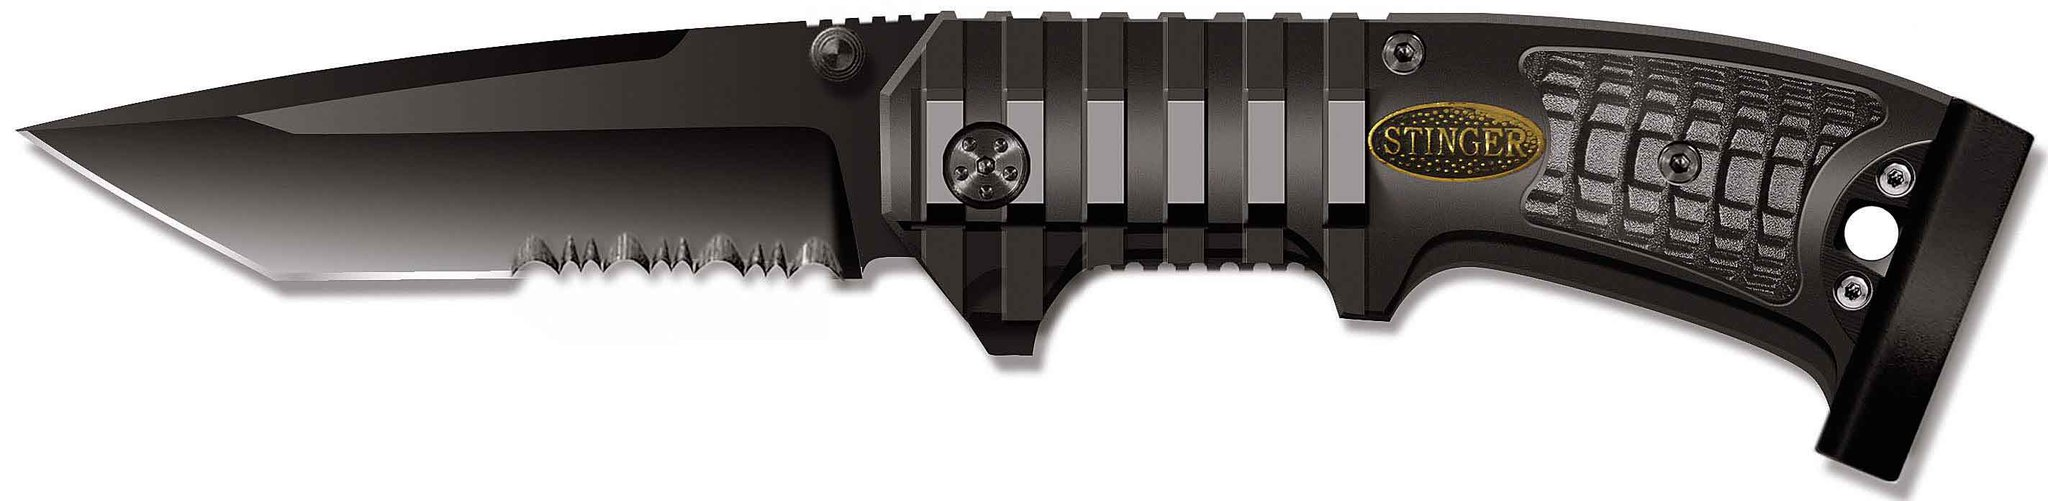 Нож складной Stinger, 90 мм (черн.), рукоять: сталь/алюмин./пласт. (черн.), с клипом, коробка картон